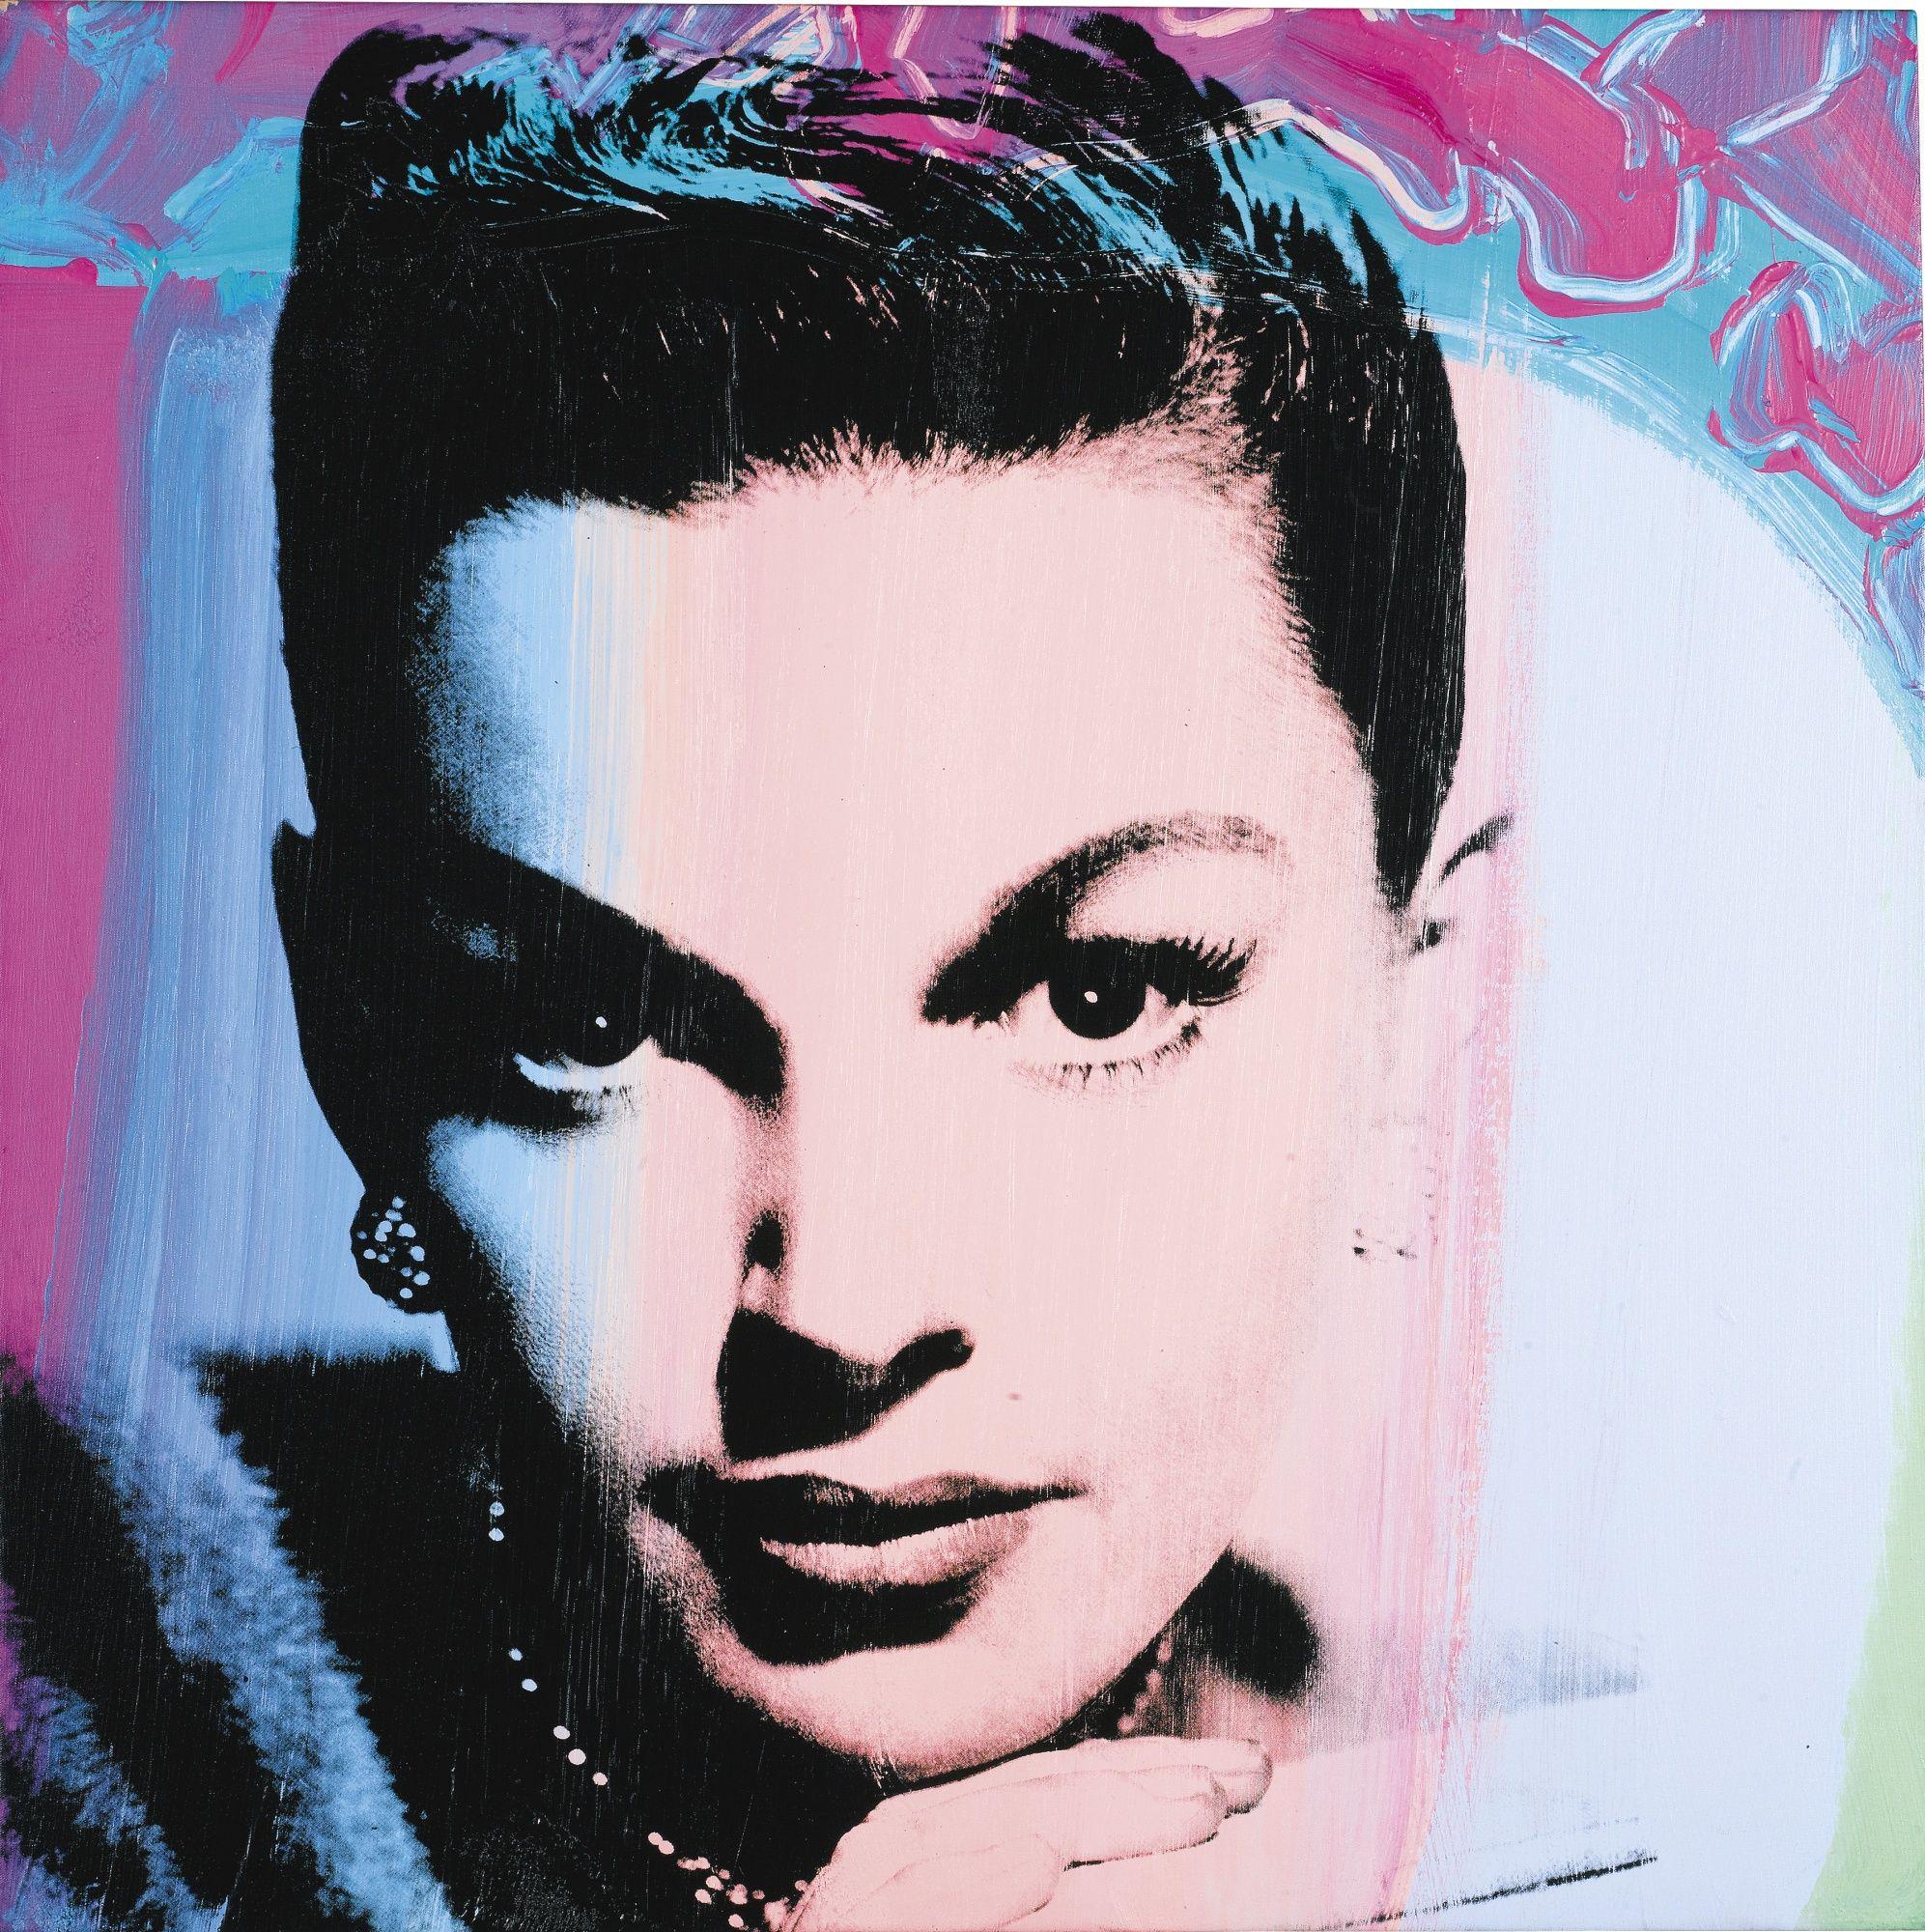 'Judy Garland' (1978) by Andy Warhol